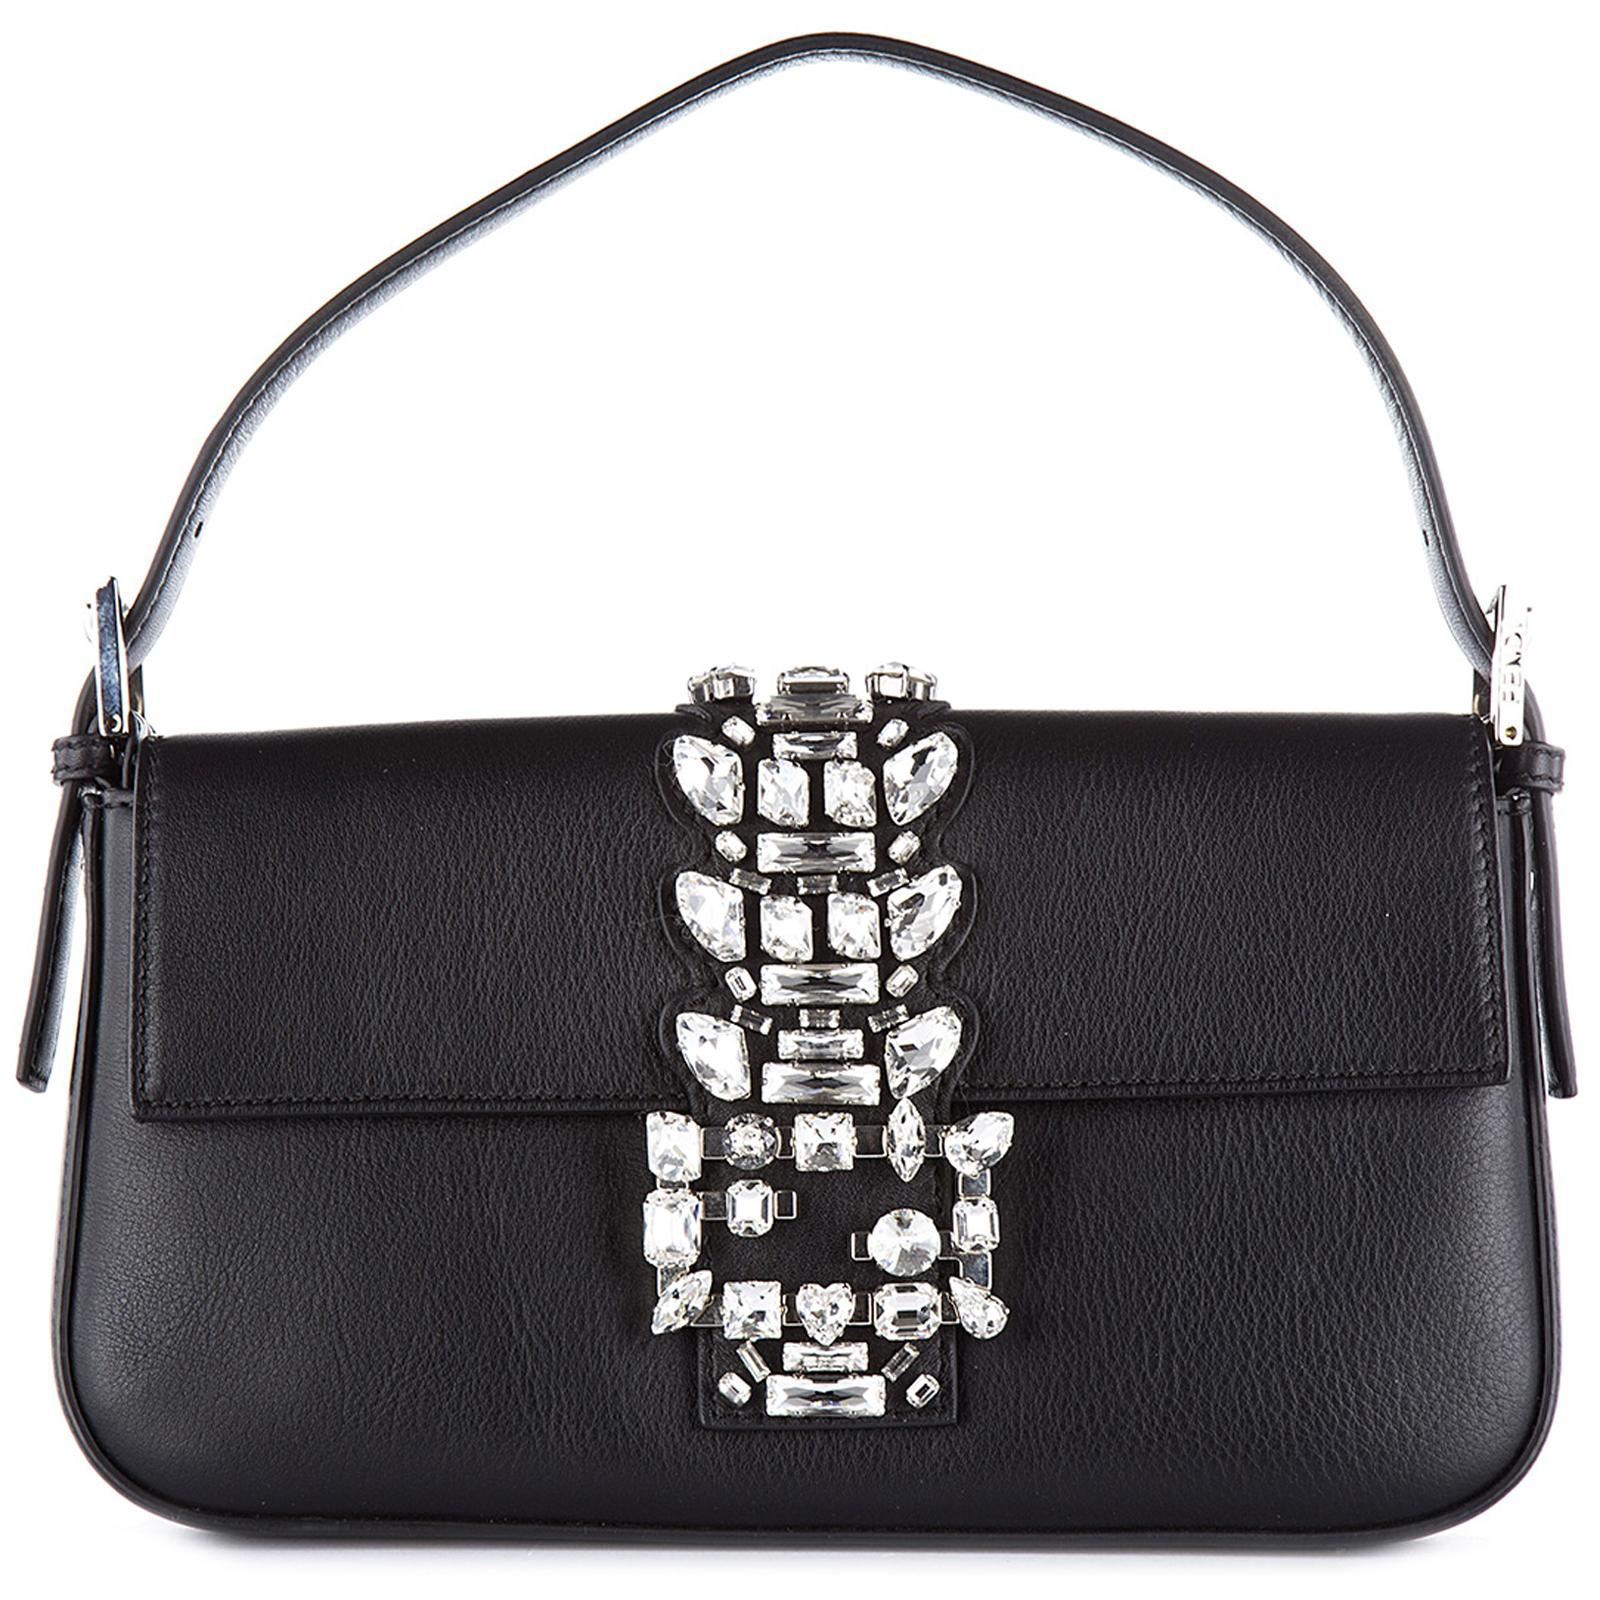 Women s leather shoulder bag baguette vitello dolce coda strass ... 26560dc019b85